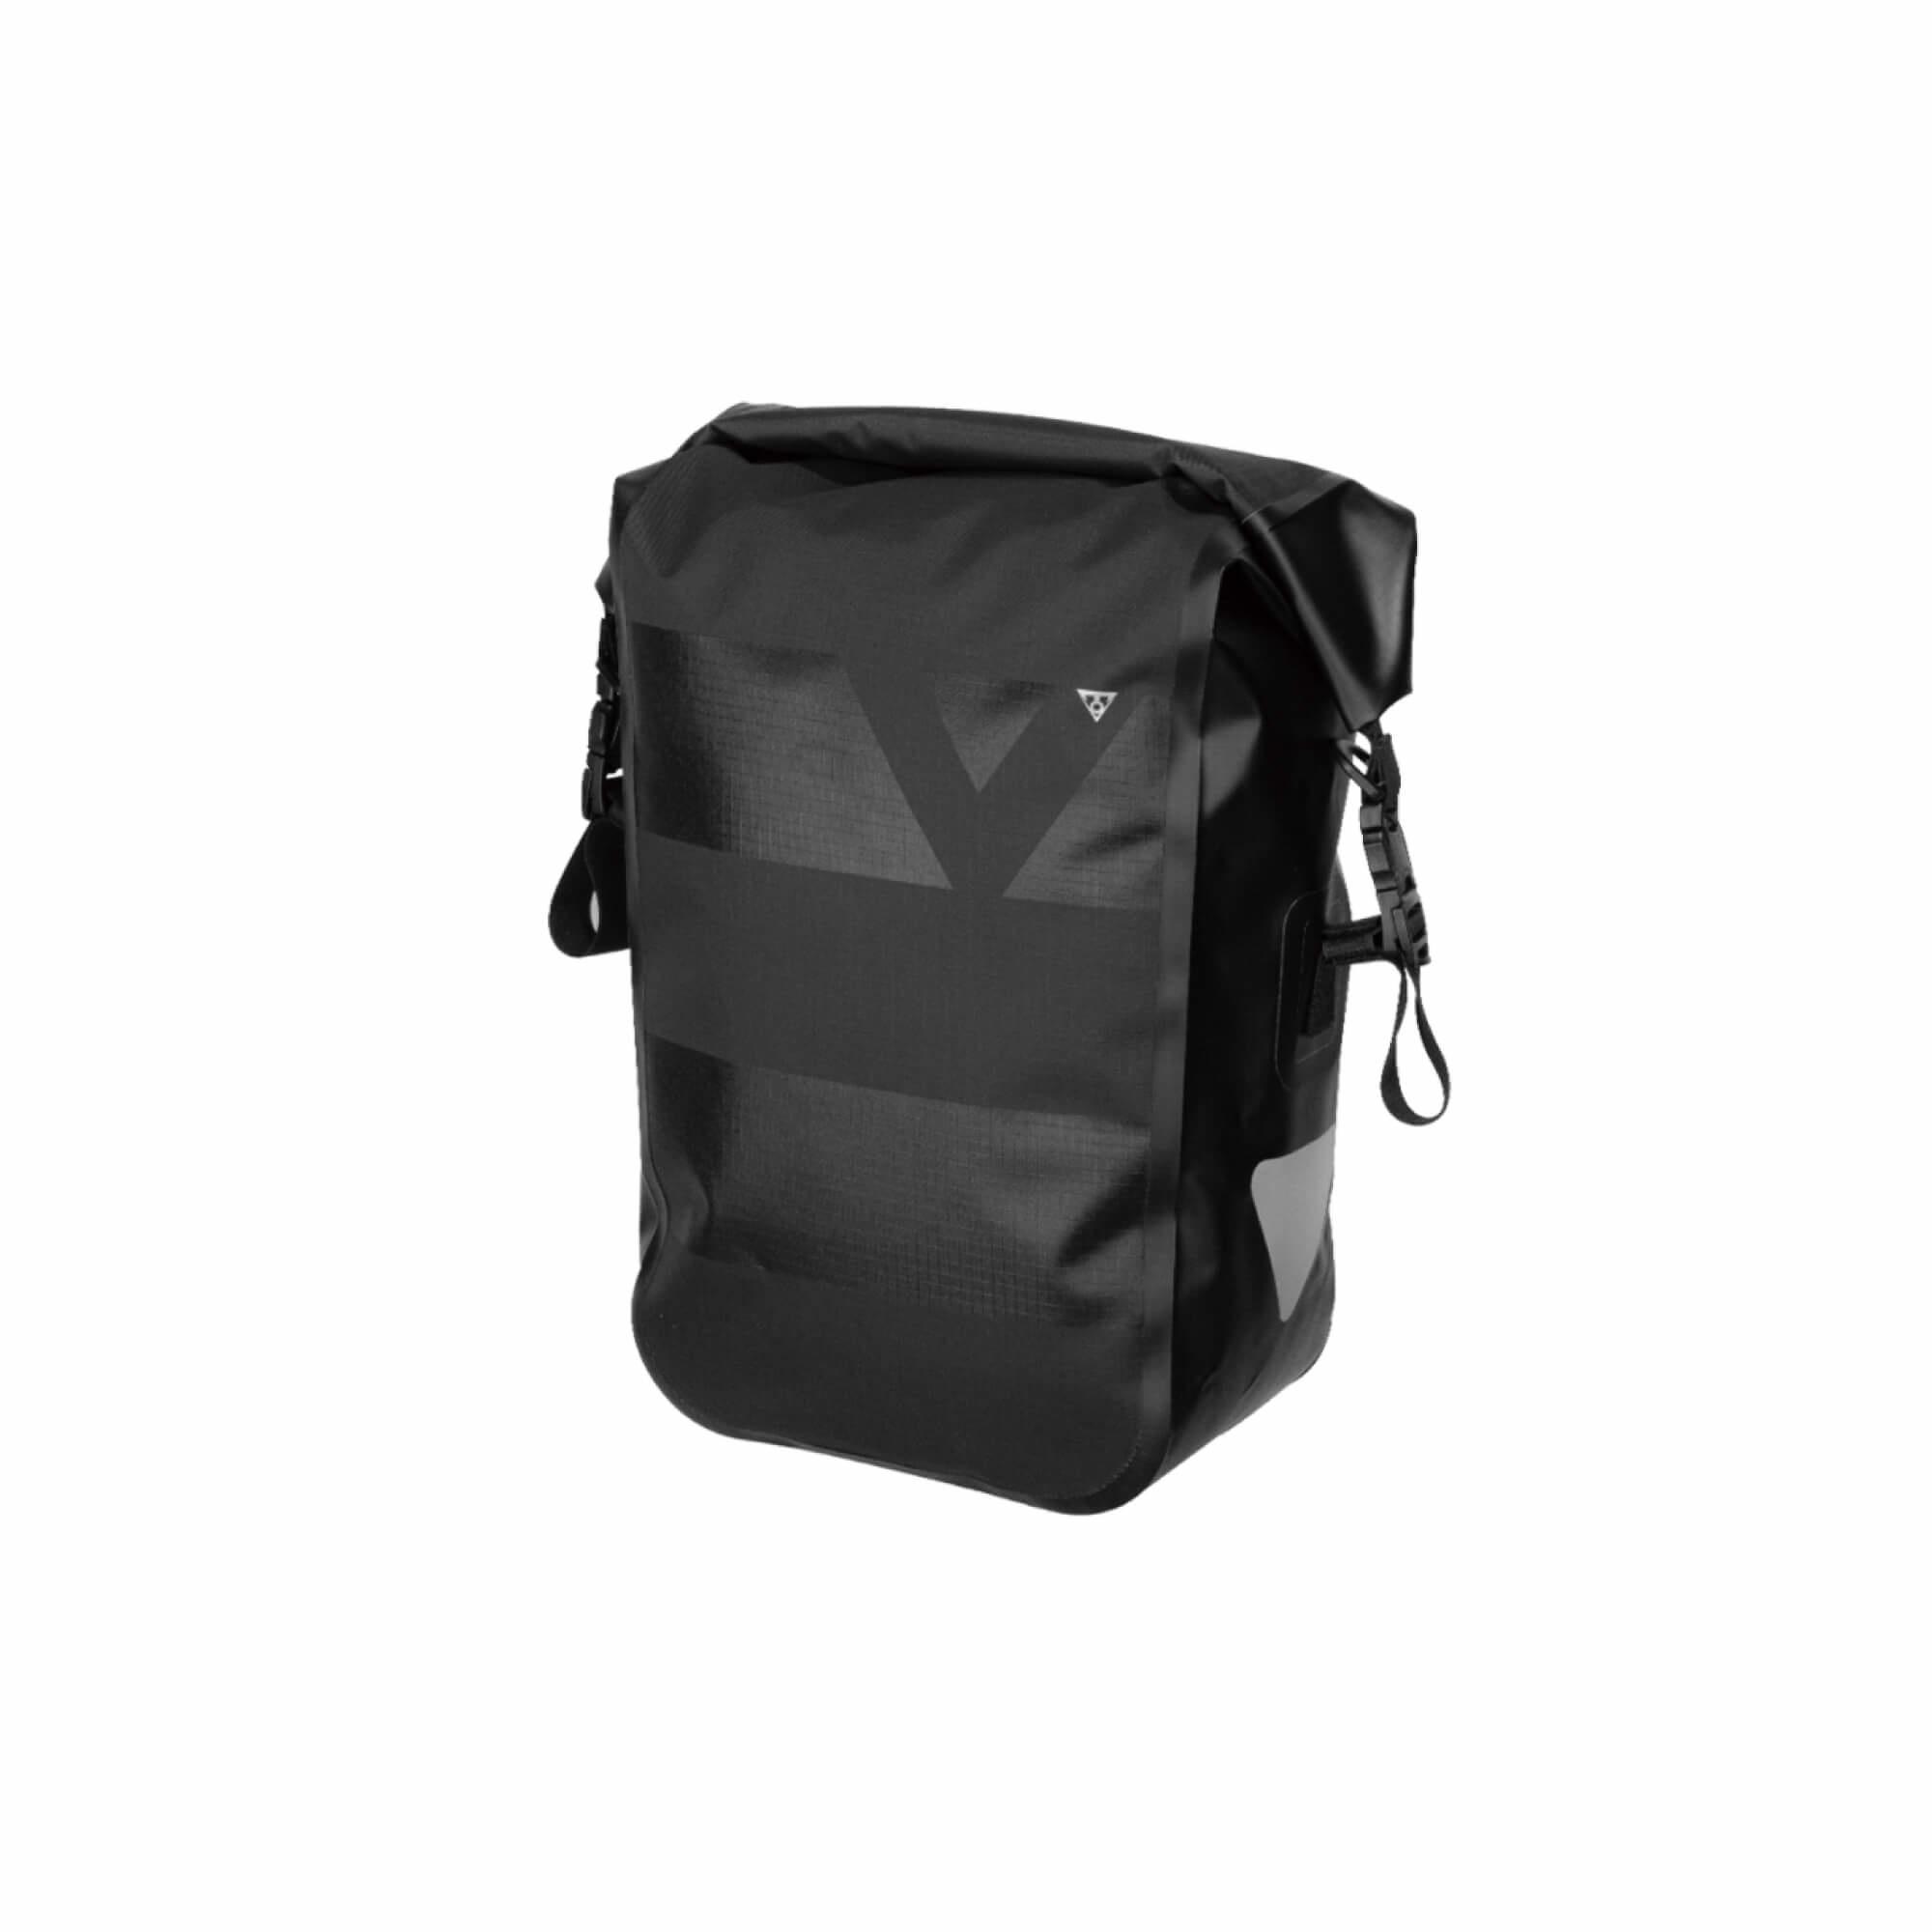 Pannier Drybag 15L One Piece Black-1